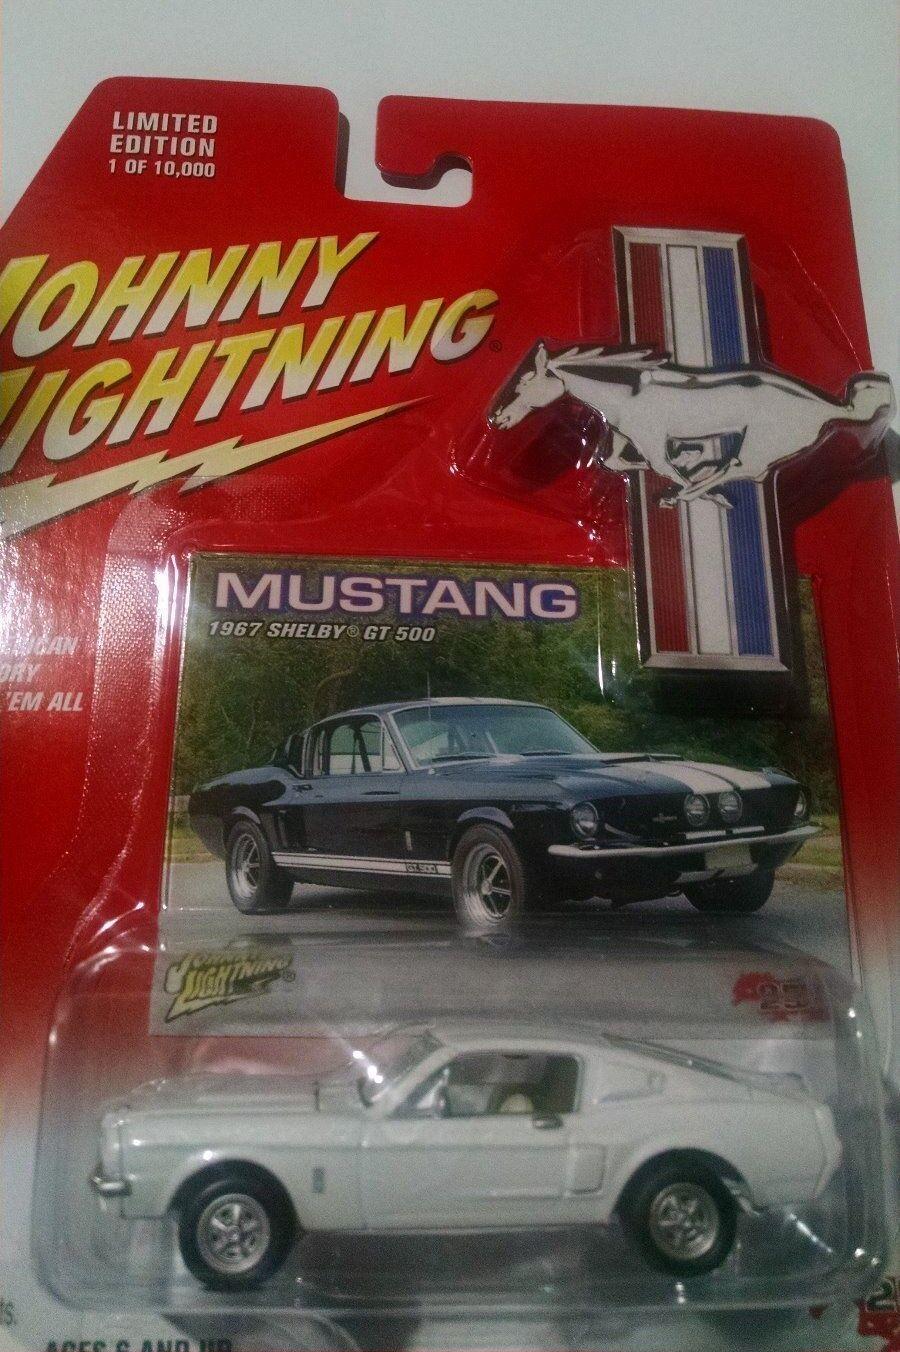 JOHNNY LIGHTNING 1967 SHELBY GT 500 500 500 SUPER RARE LIMITED EDITION 97a0de